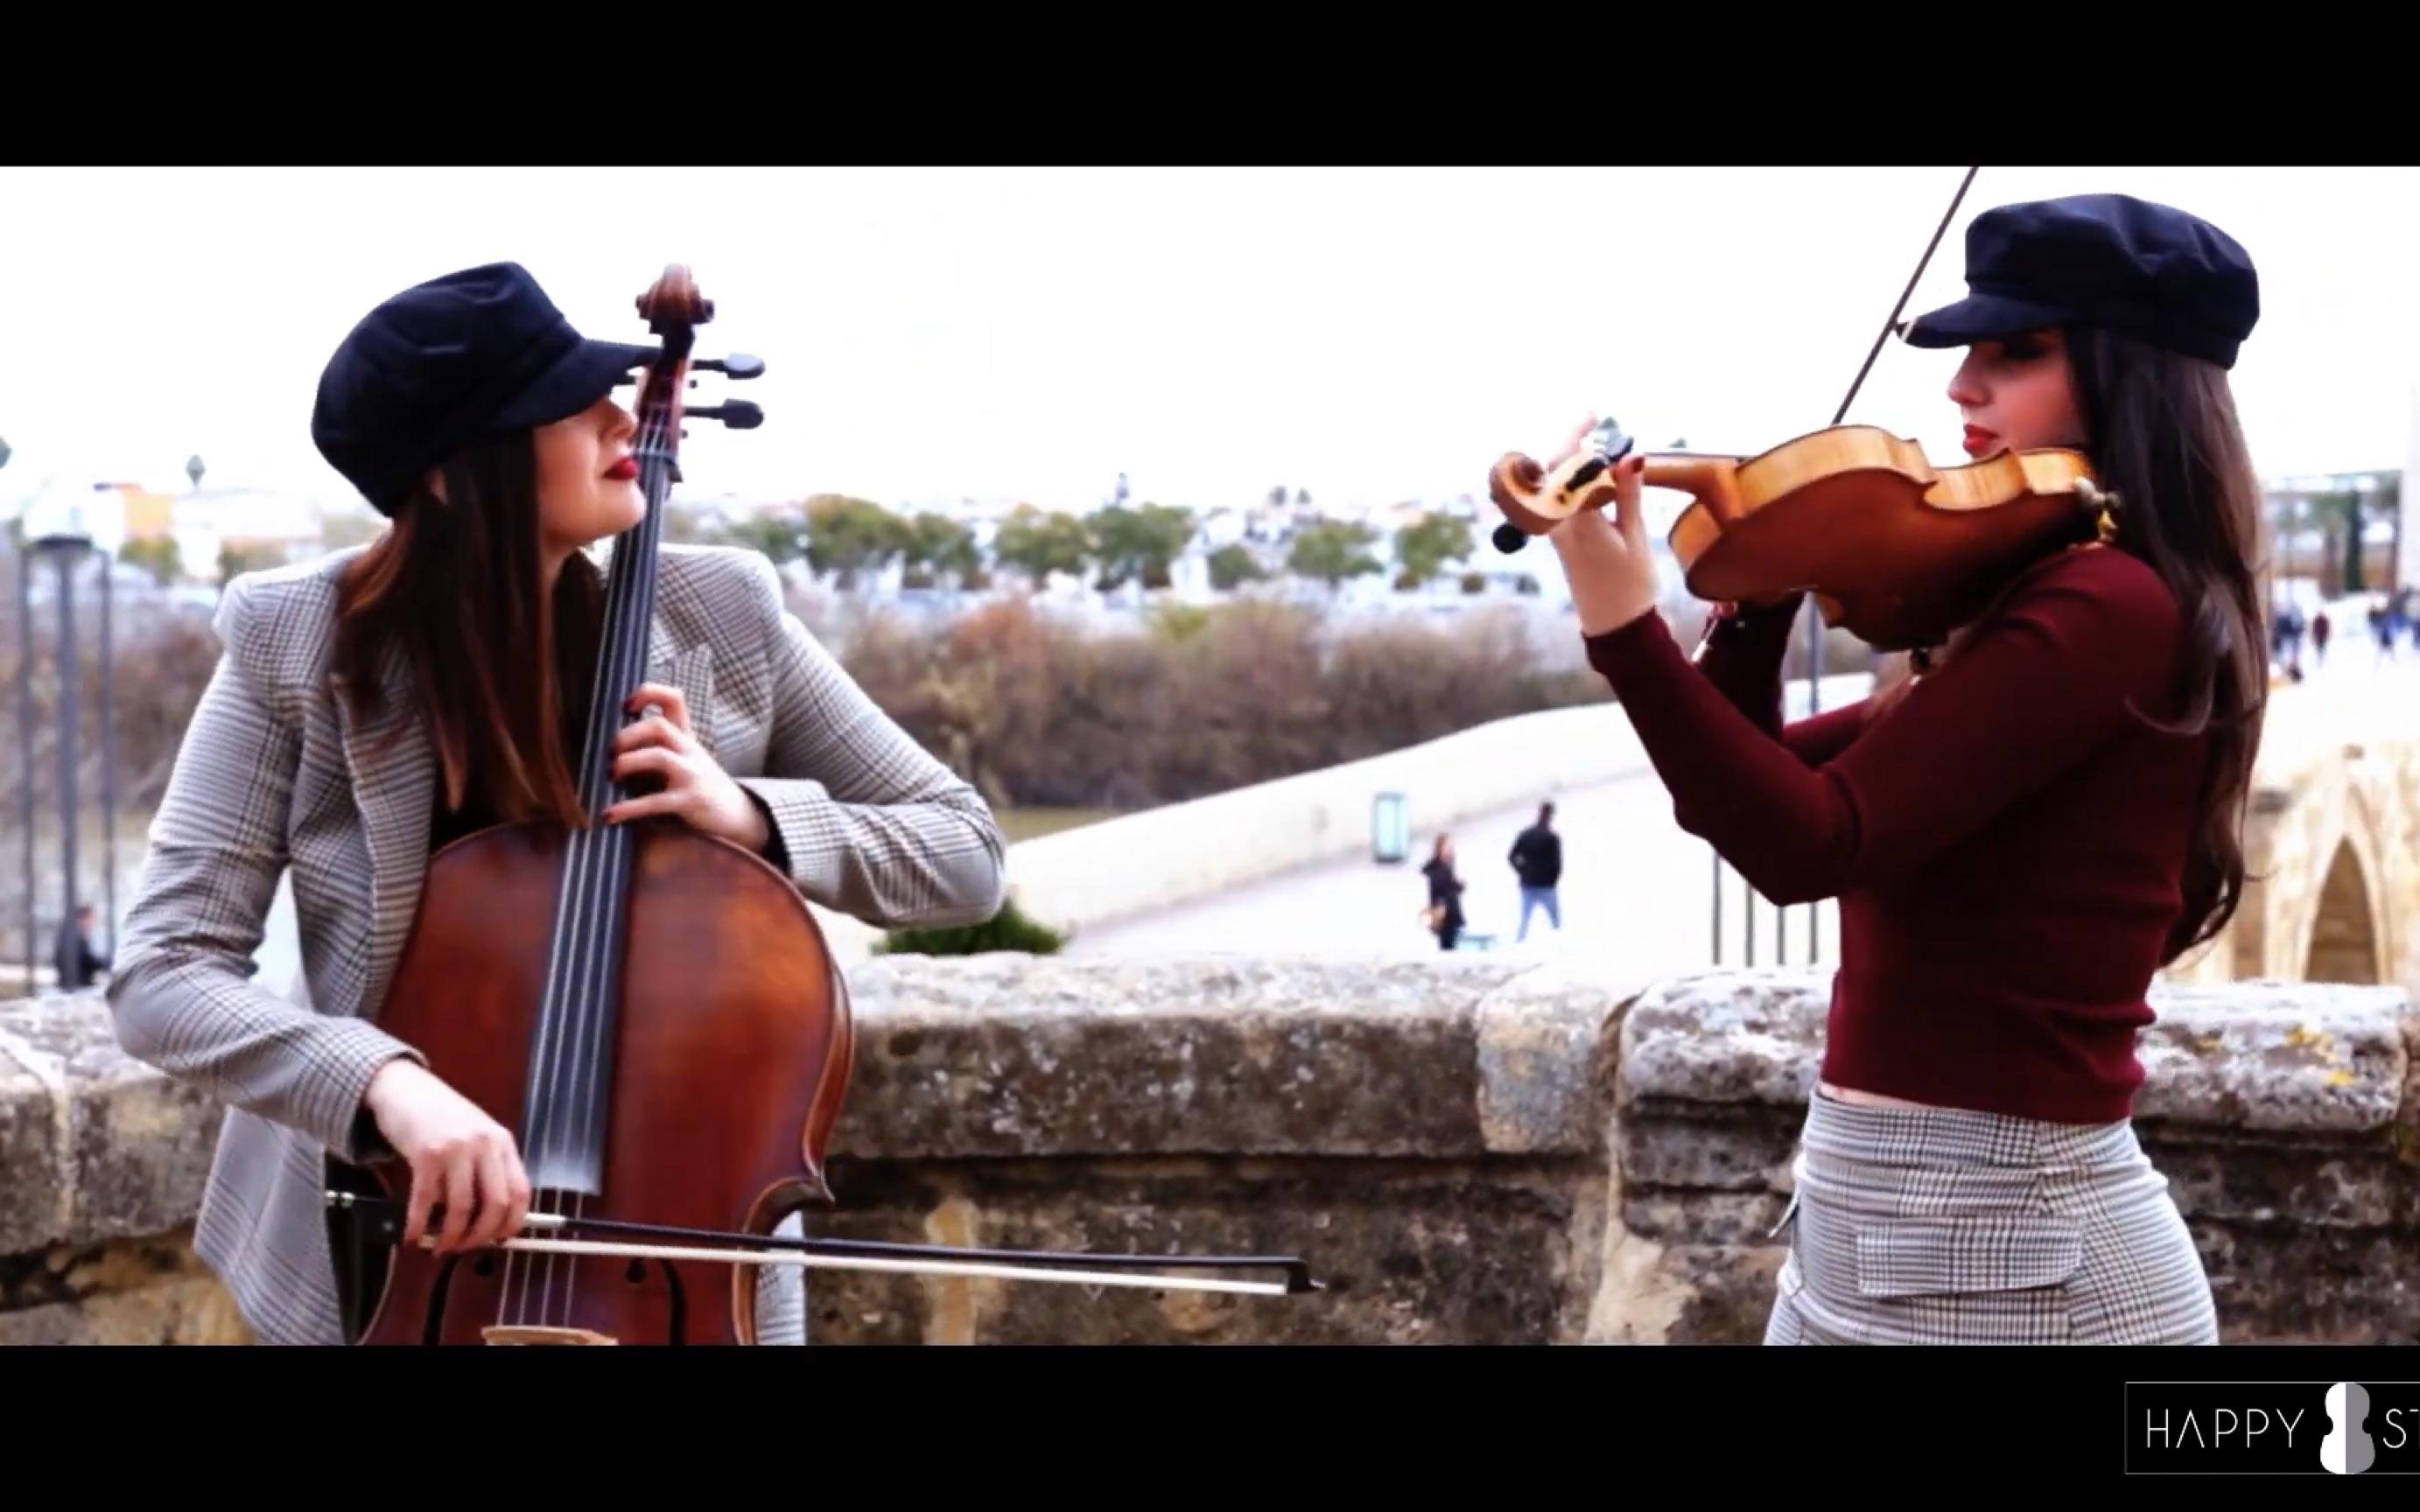 酷玩乐队 Viva La Vida - Coldplay 小提琴 u0026 大提琴 二重奏 / HAPPY STRINGS ( Violin u0026 Cello )